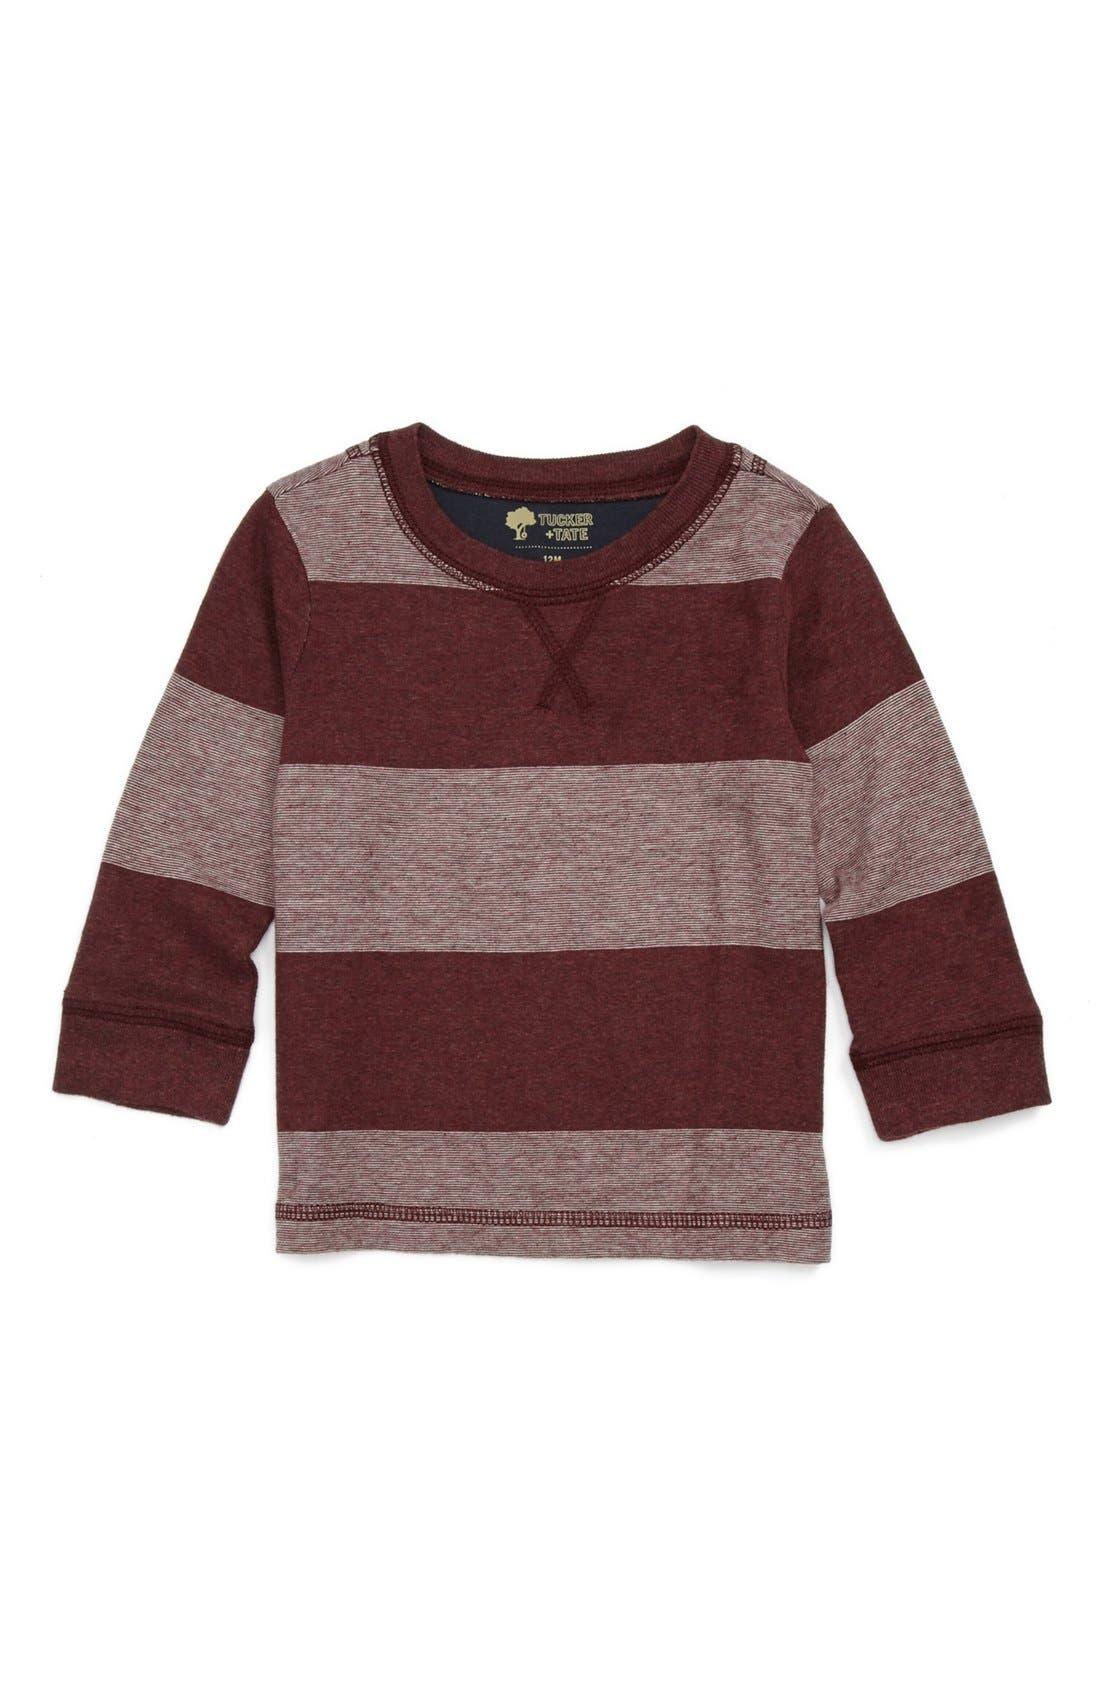 Alternate Image 1 Selected - Tucker + Tate 'Sultan' T-Shirt (Baby Boys)